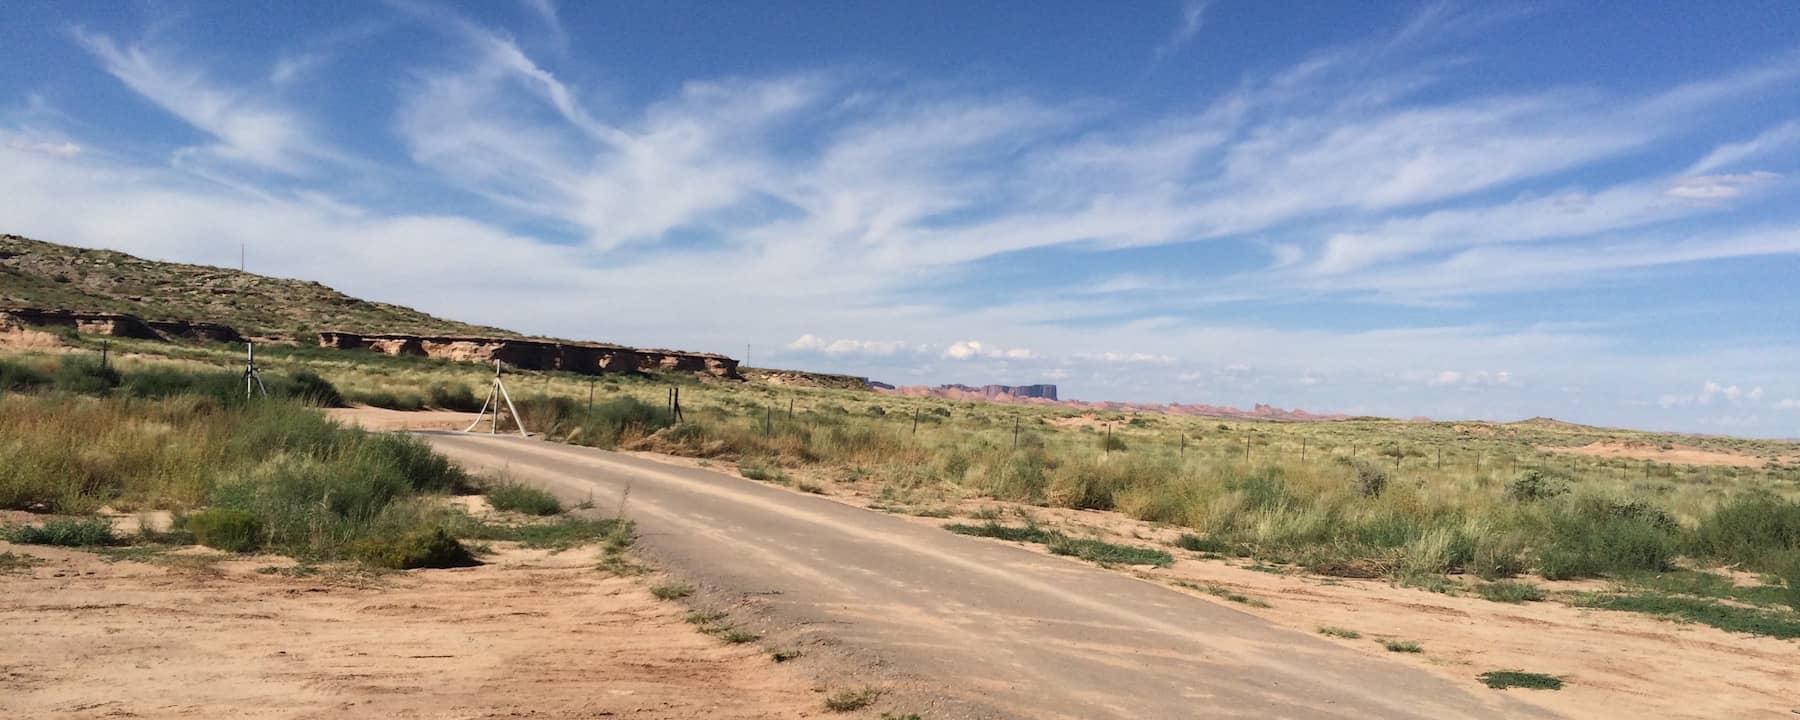 Route 66 Videos